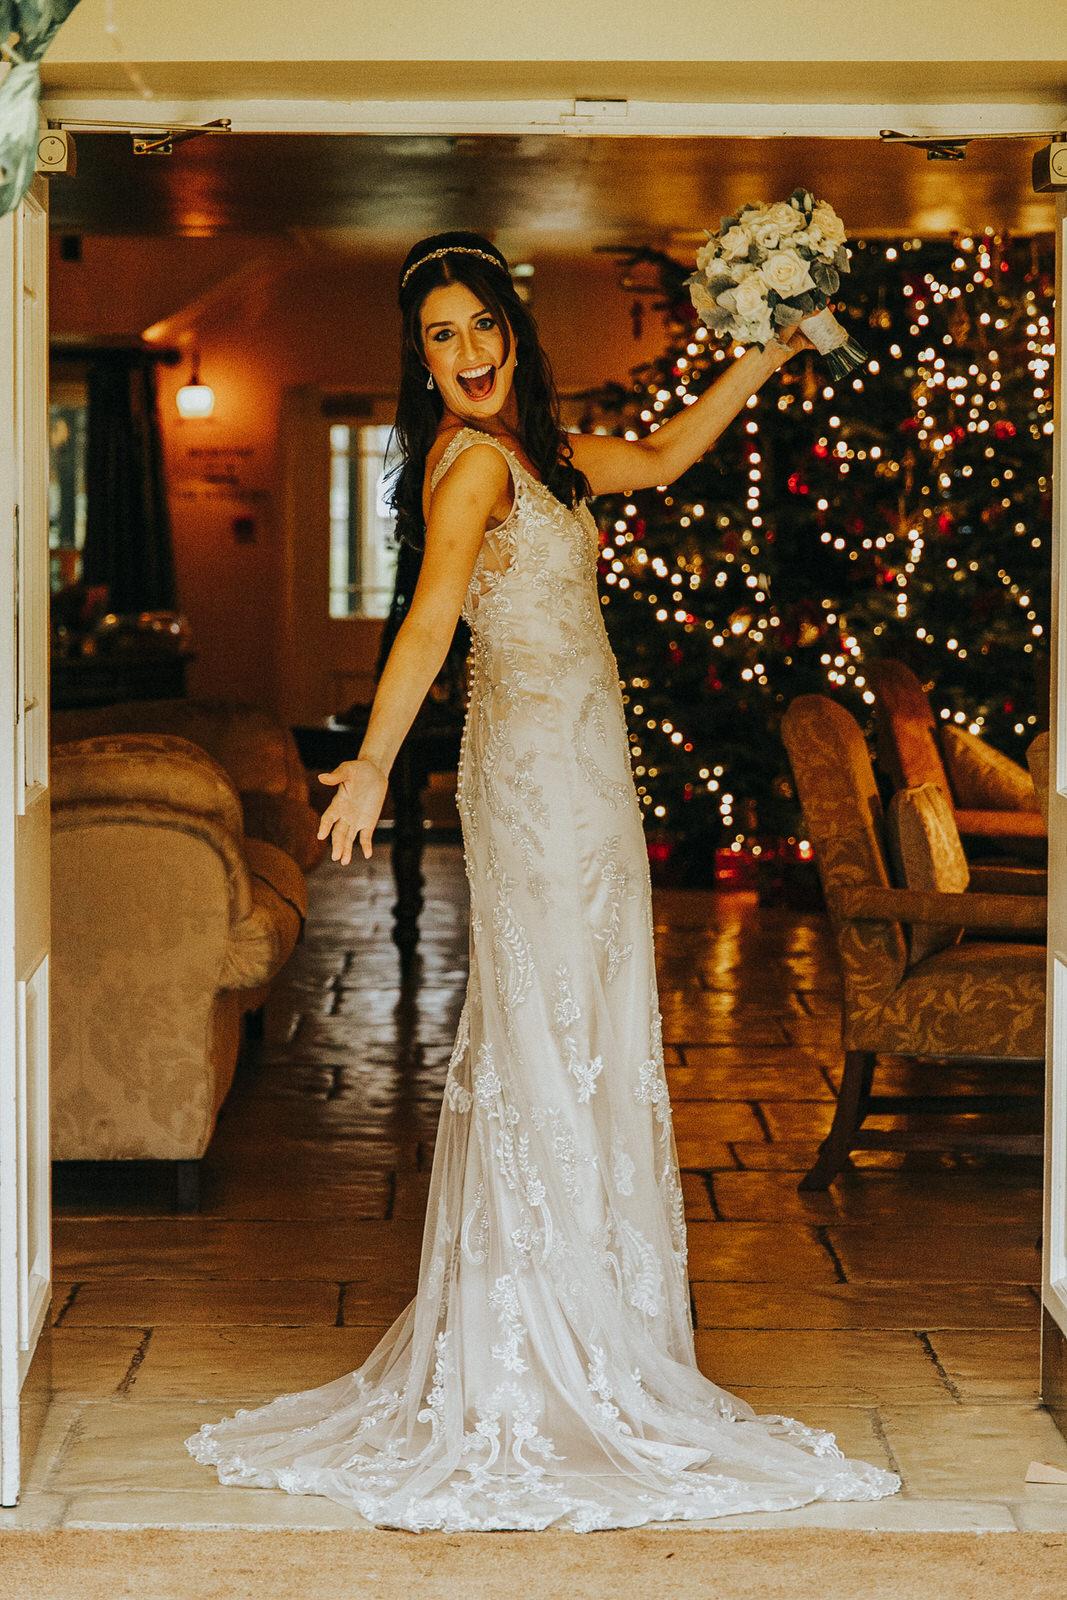 Roger_Kenny_wedding_photographer_Brooklodge__657.jpg